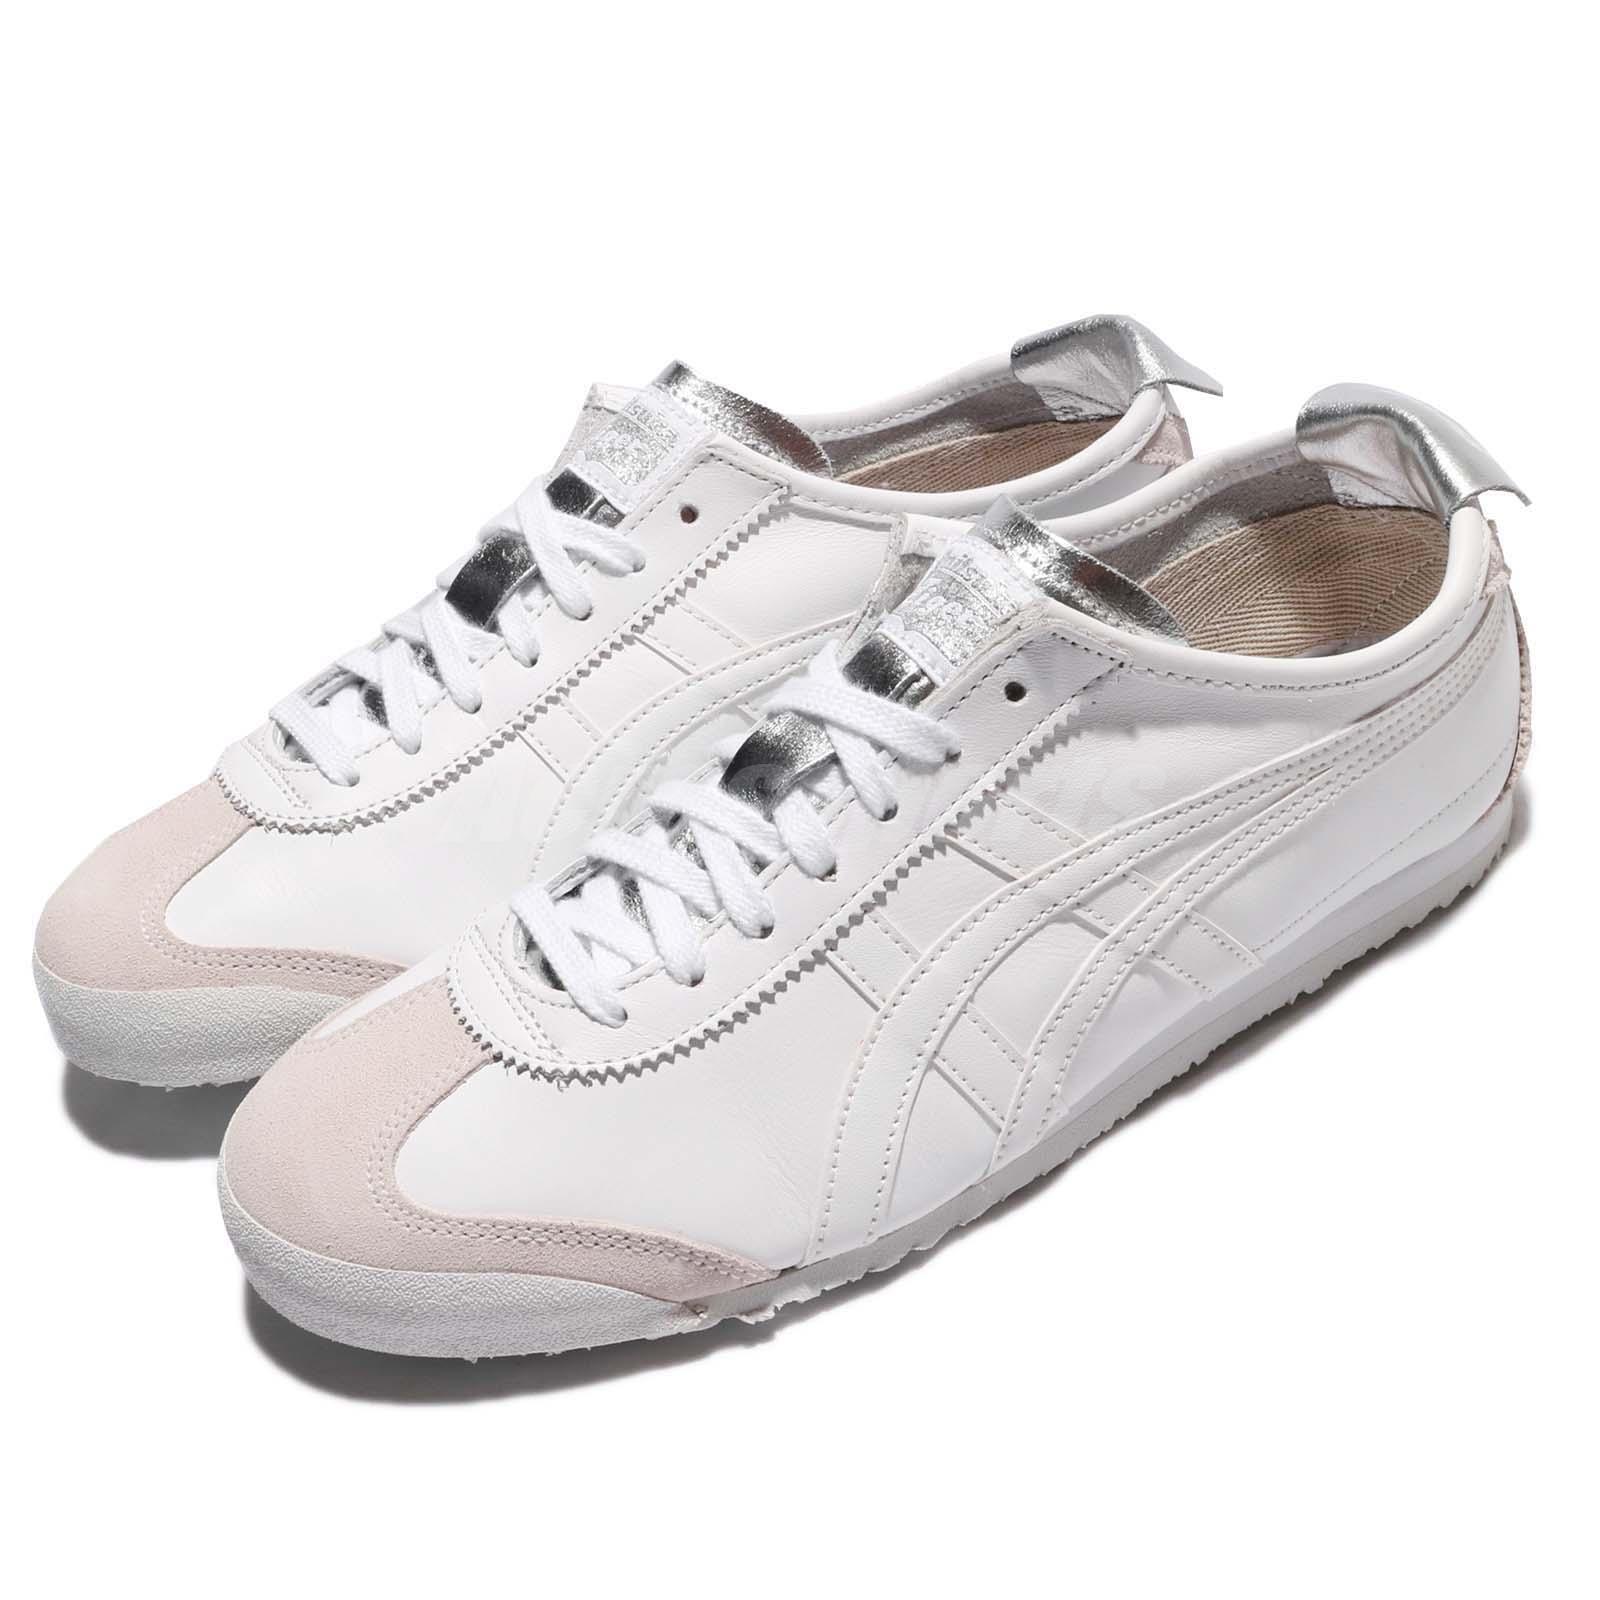 Asics Onitsuka Tiger Mexico 66 blanco Leather Men mujer zapatos zapatillas D7C3L-0101